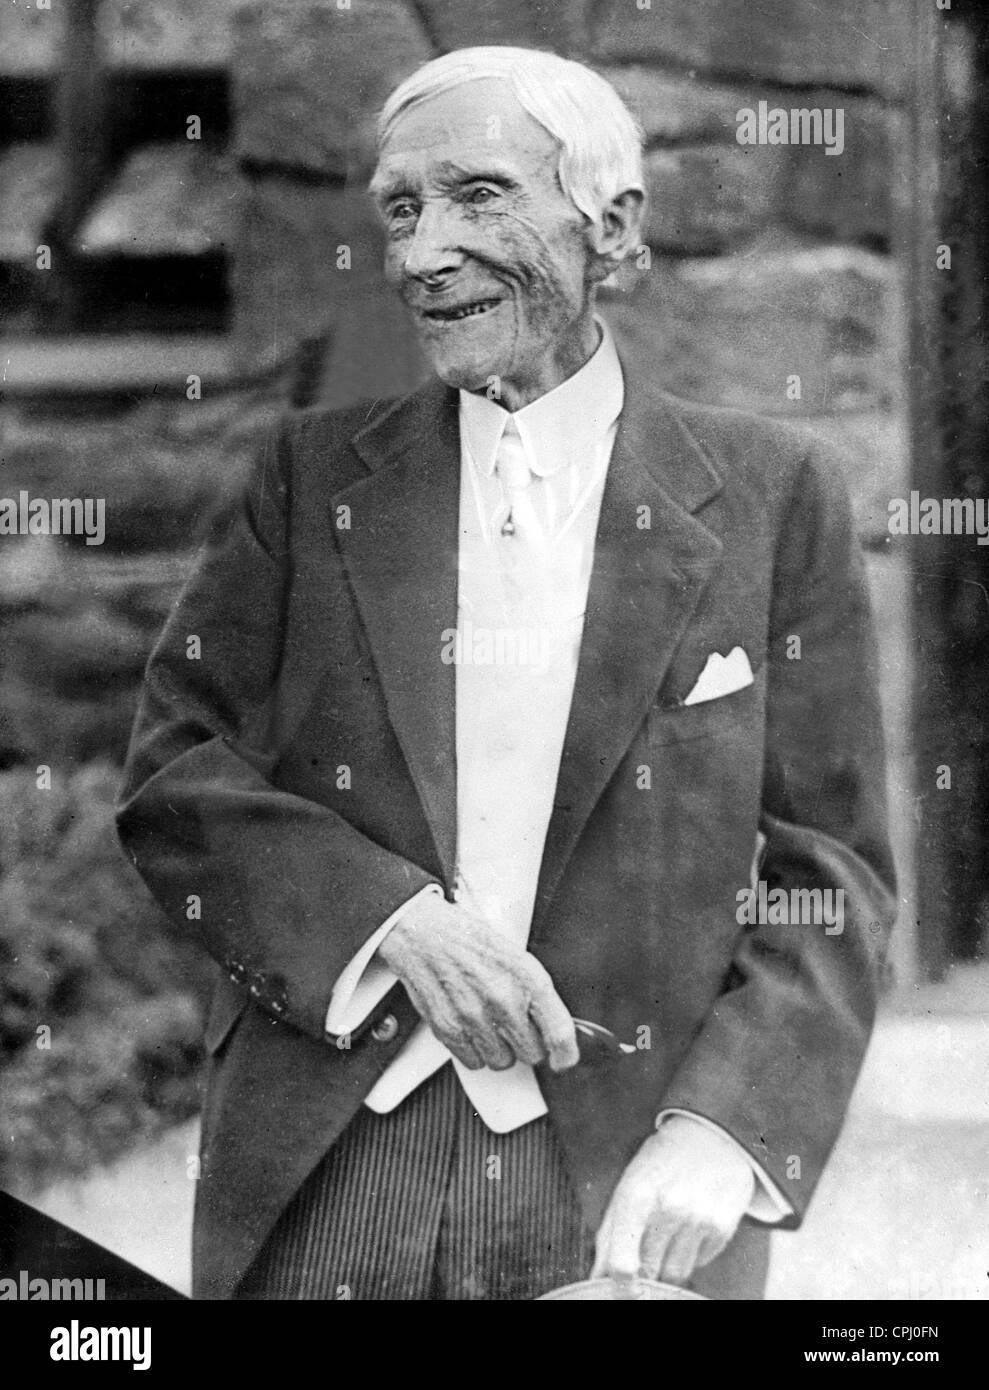 John Davidson Rockefeller, 1934 - Stock Image